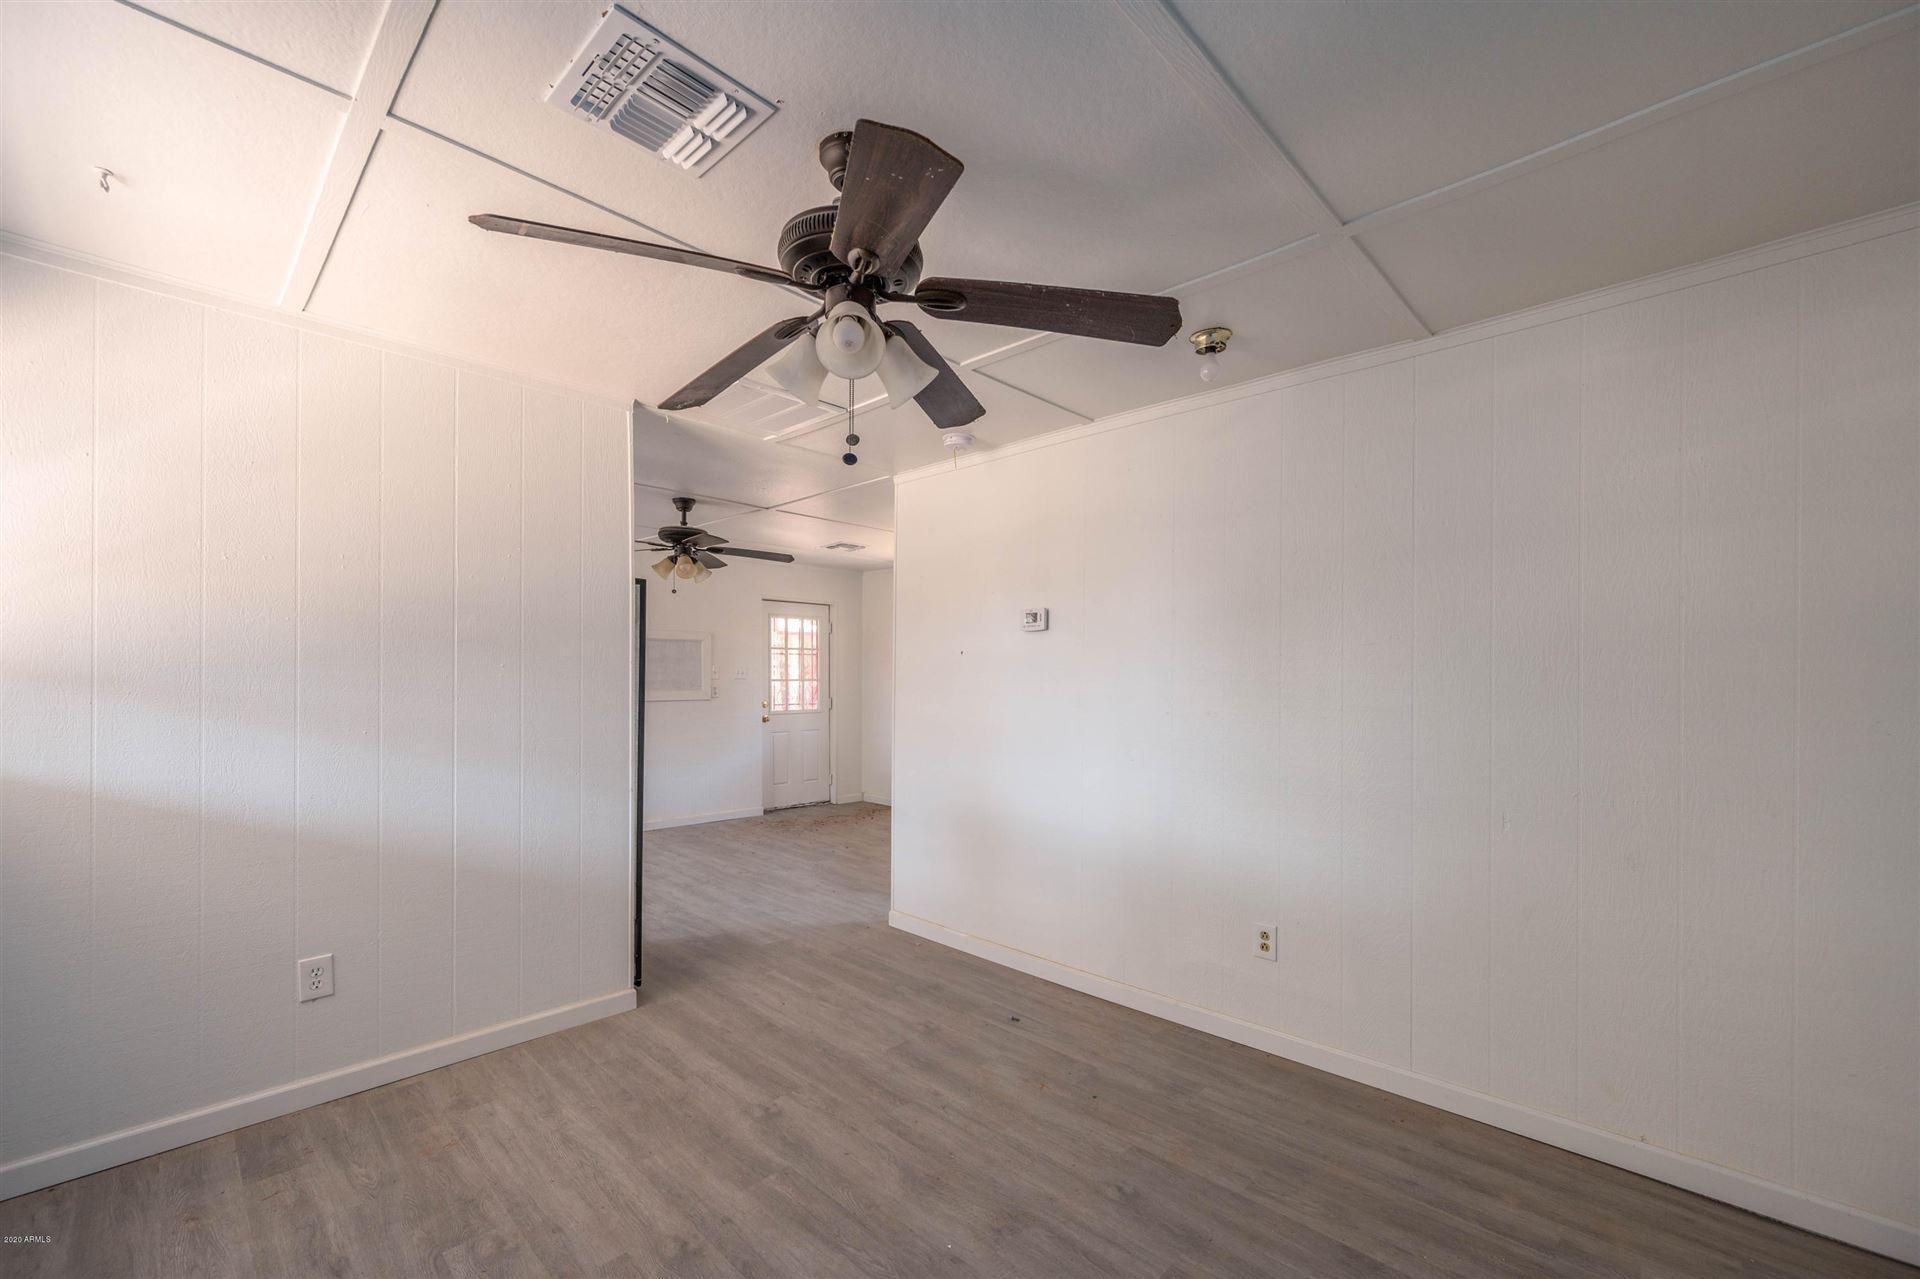 3315 E CAMBRIDGE Avenue, Phoenix, AZ 85008 - MLS#: 6105776